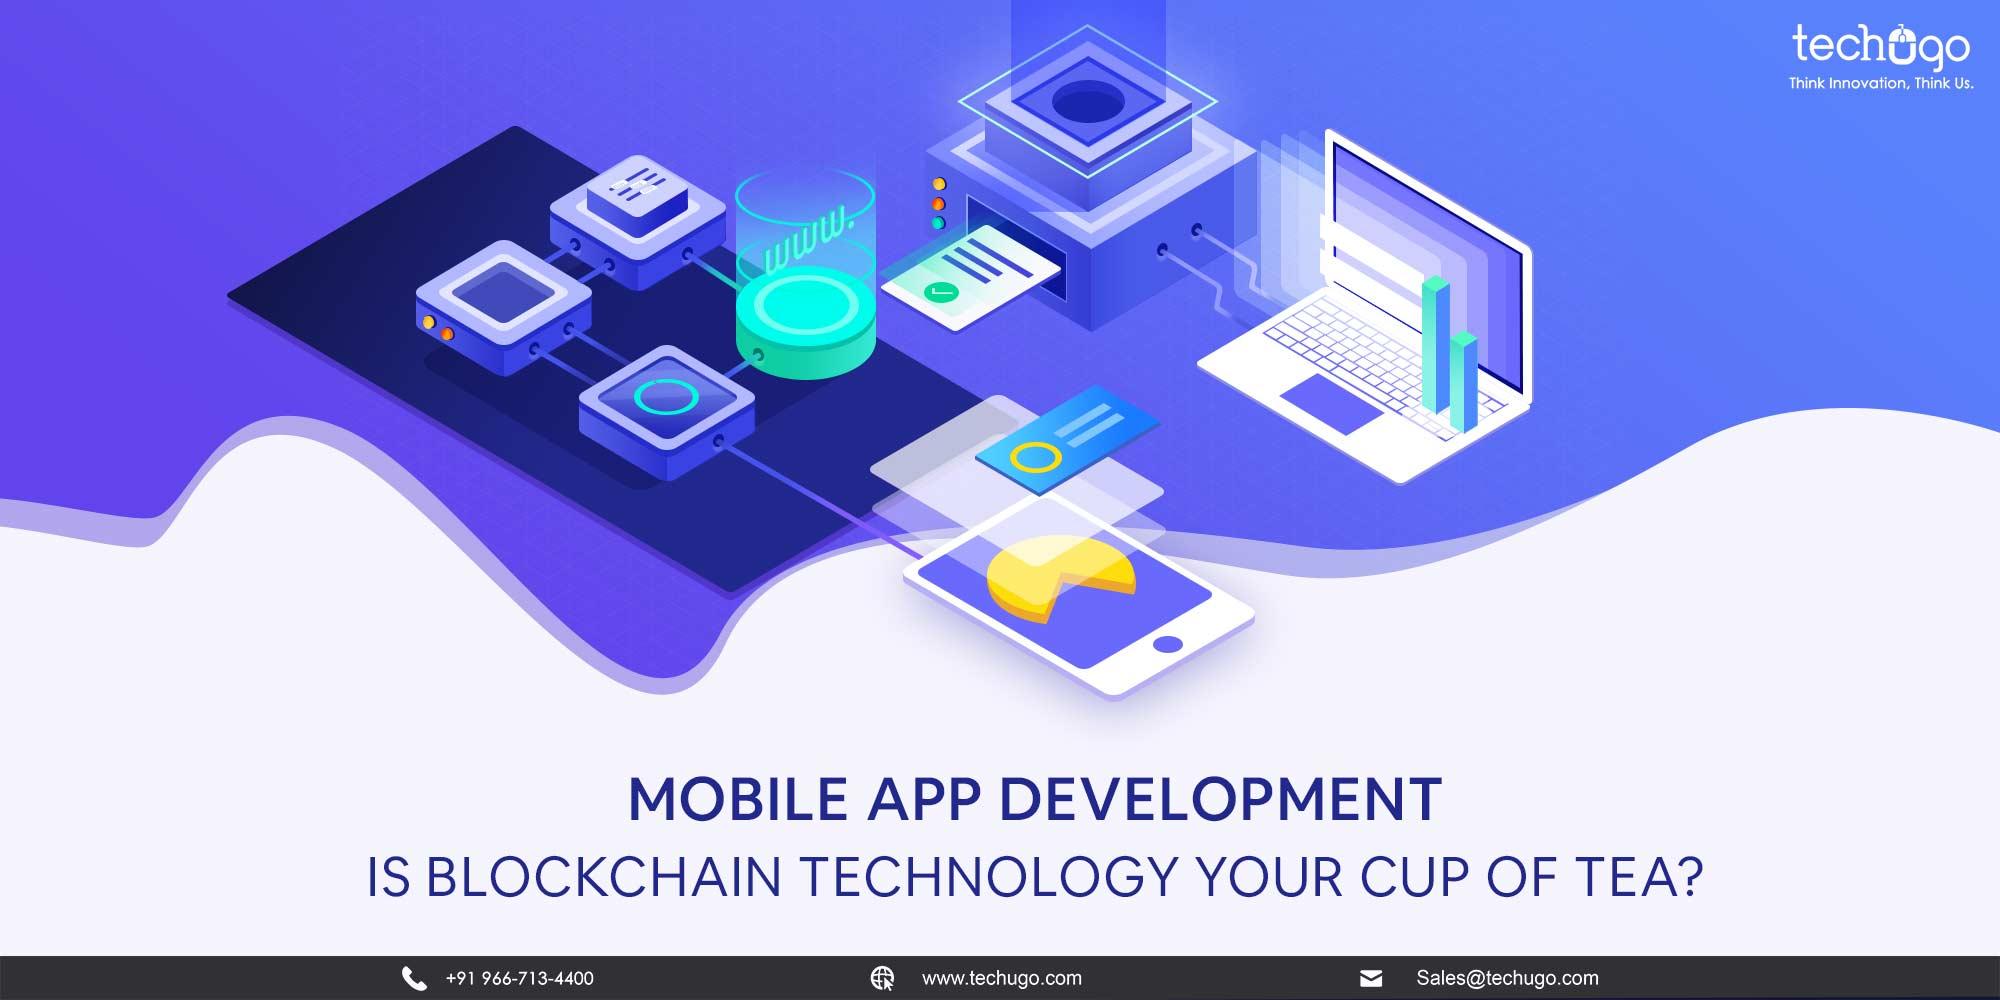 Blockchain Technology and Mobile App Development